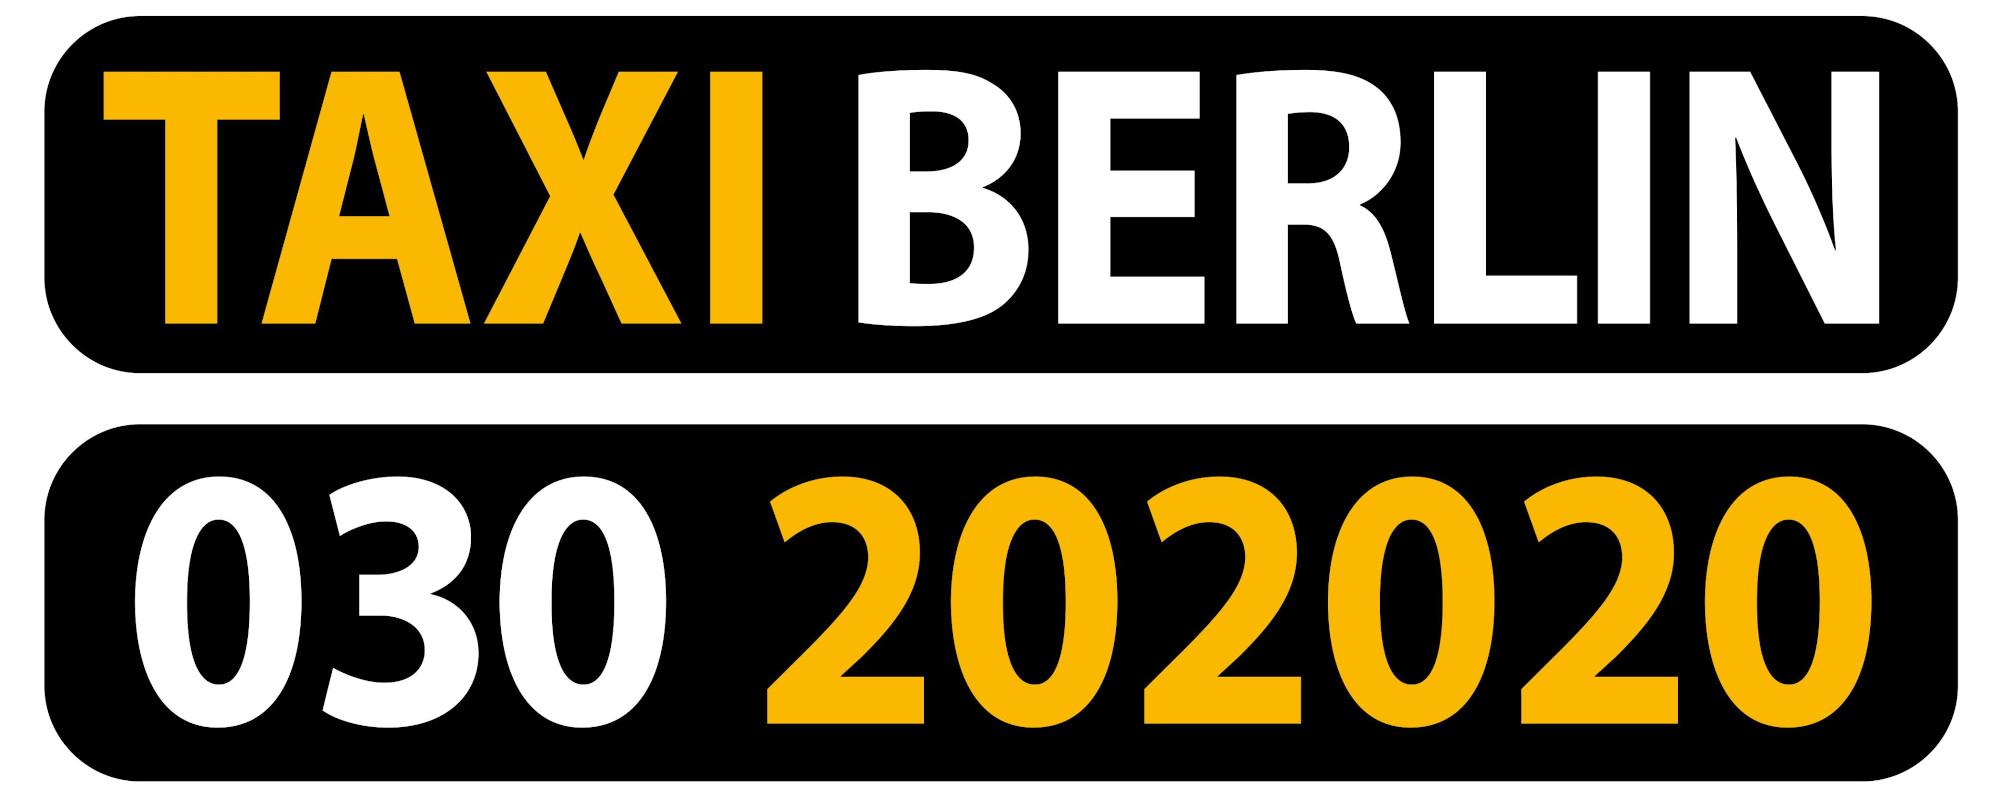 Taxi Berlin - Logo